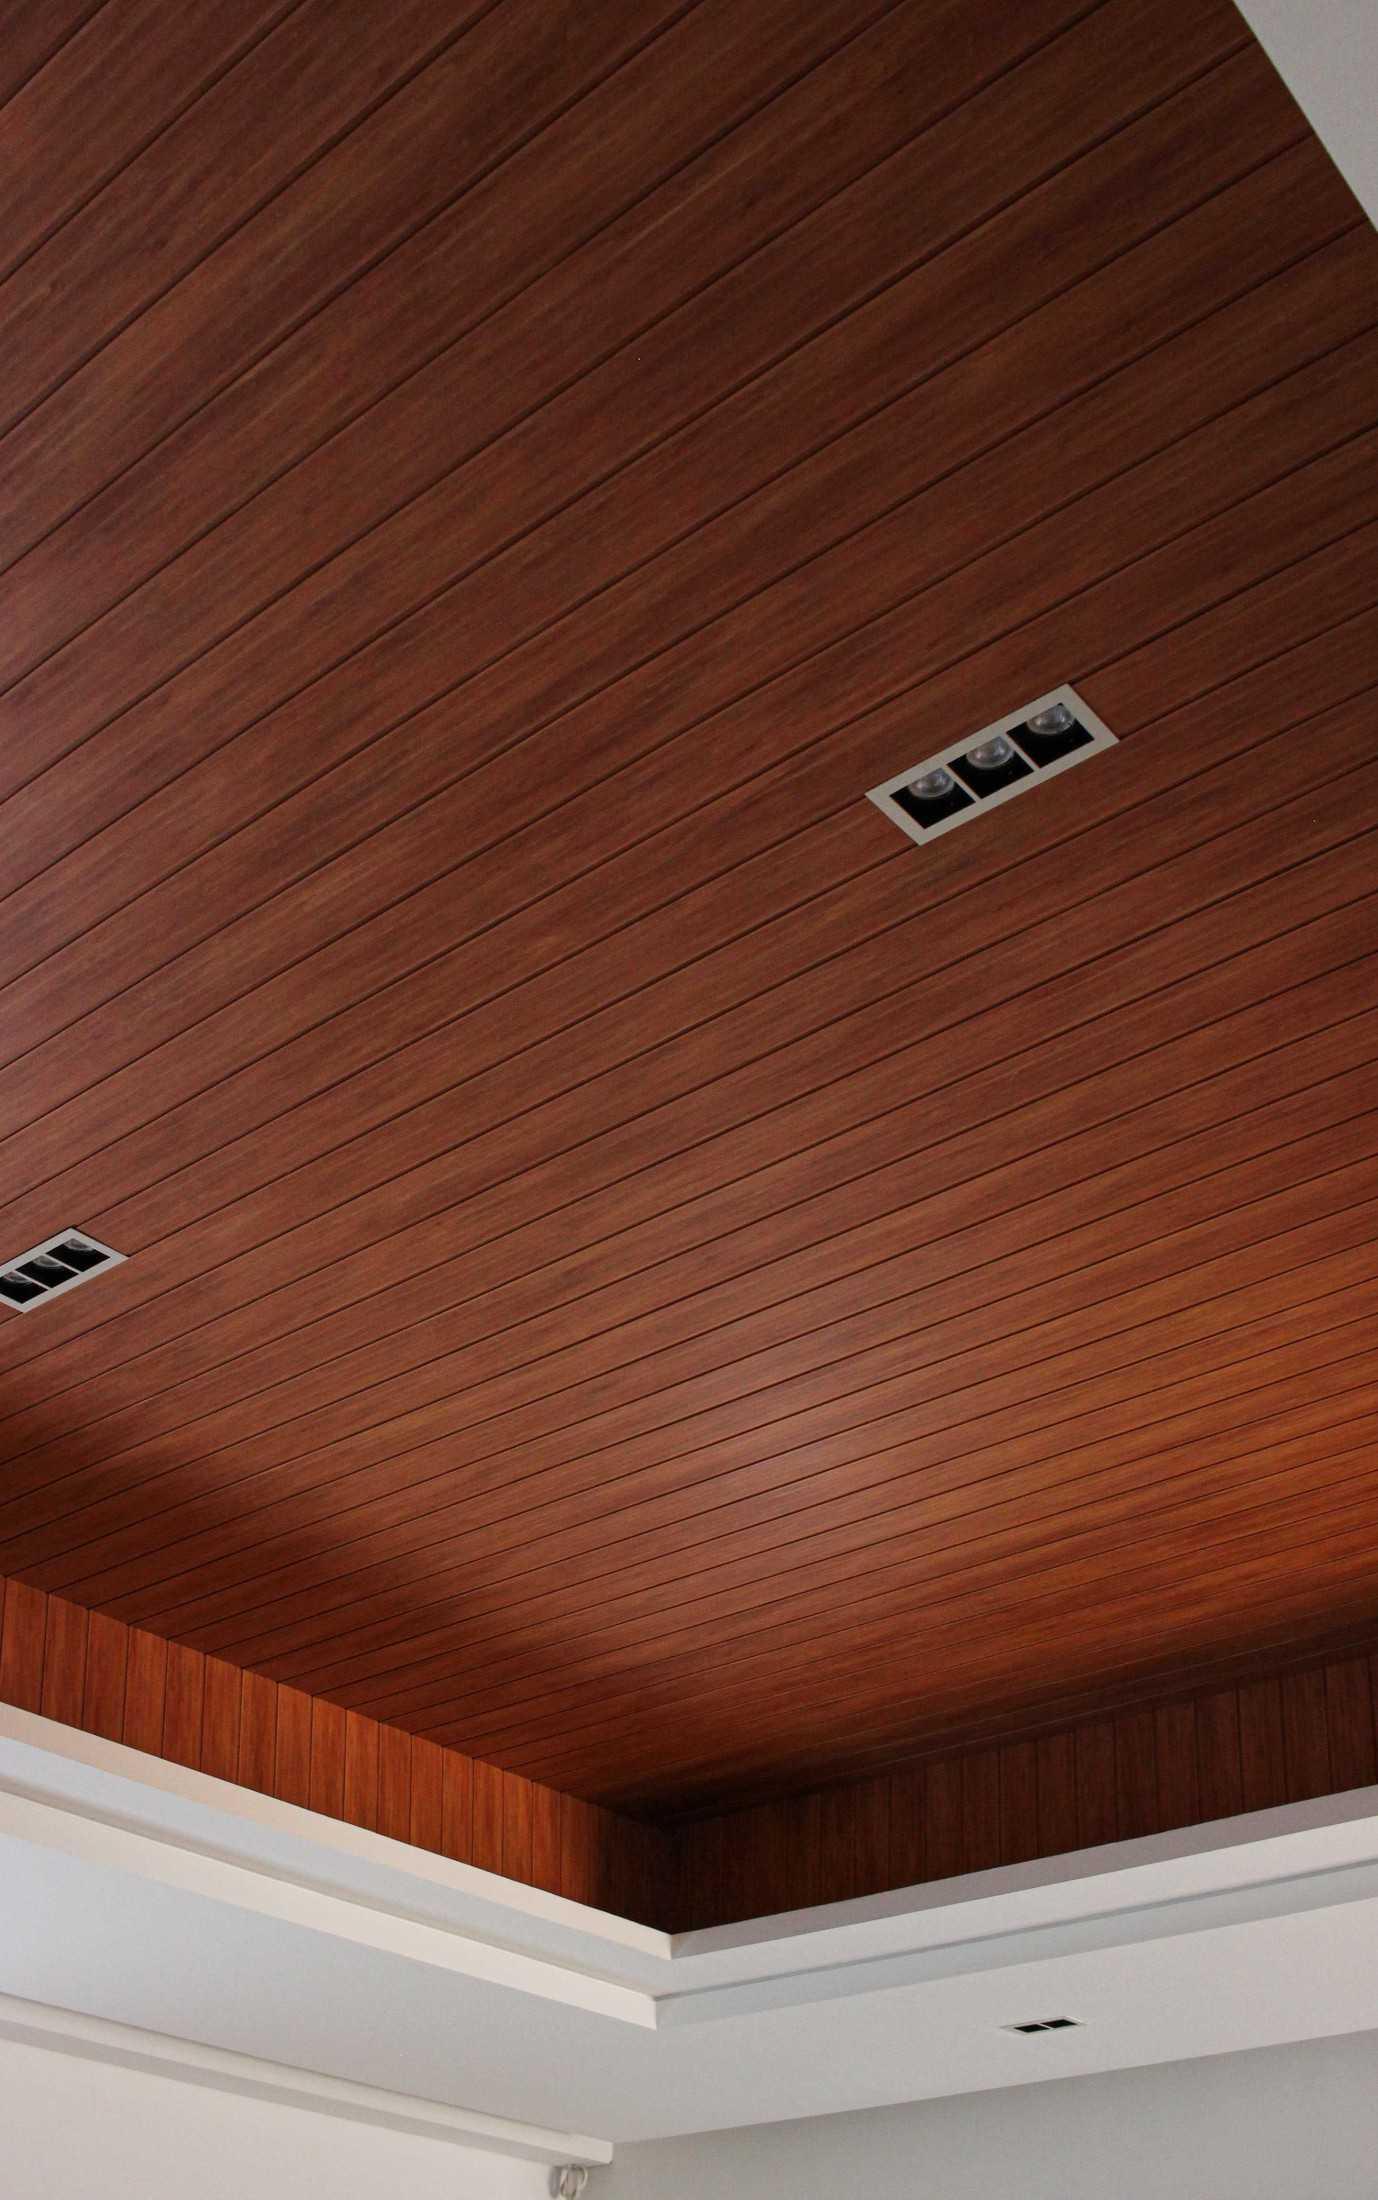 Y0 Design Architect S House Kec. Srono, Kabupaten Banyuwangi, Jawa Timur, Indonesia Kec. Srono, Kabupaten Banyuwangi, Jawa Timur, Indonesia Yohanes-Iswara-Limandjaya-S-House  121097